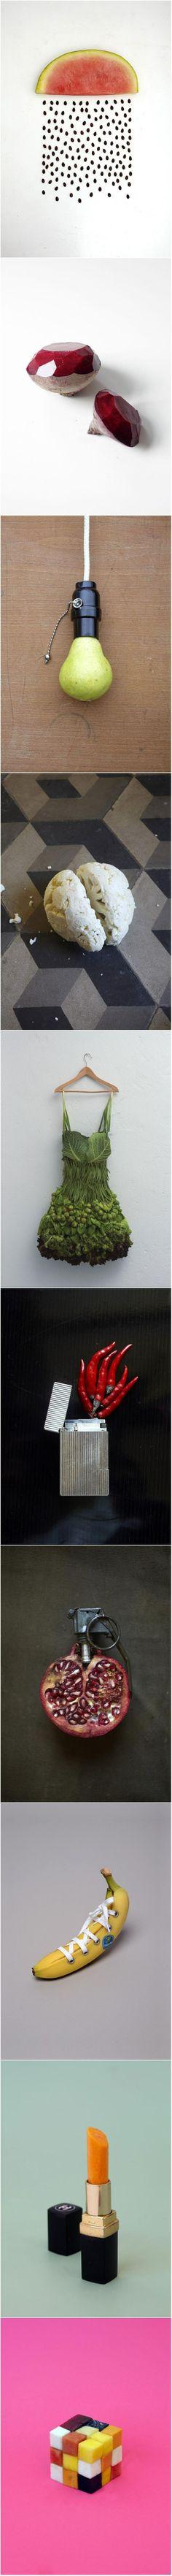 Creative food art